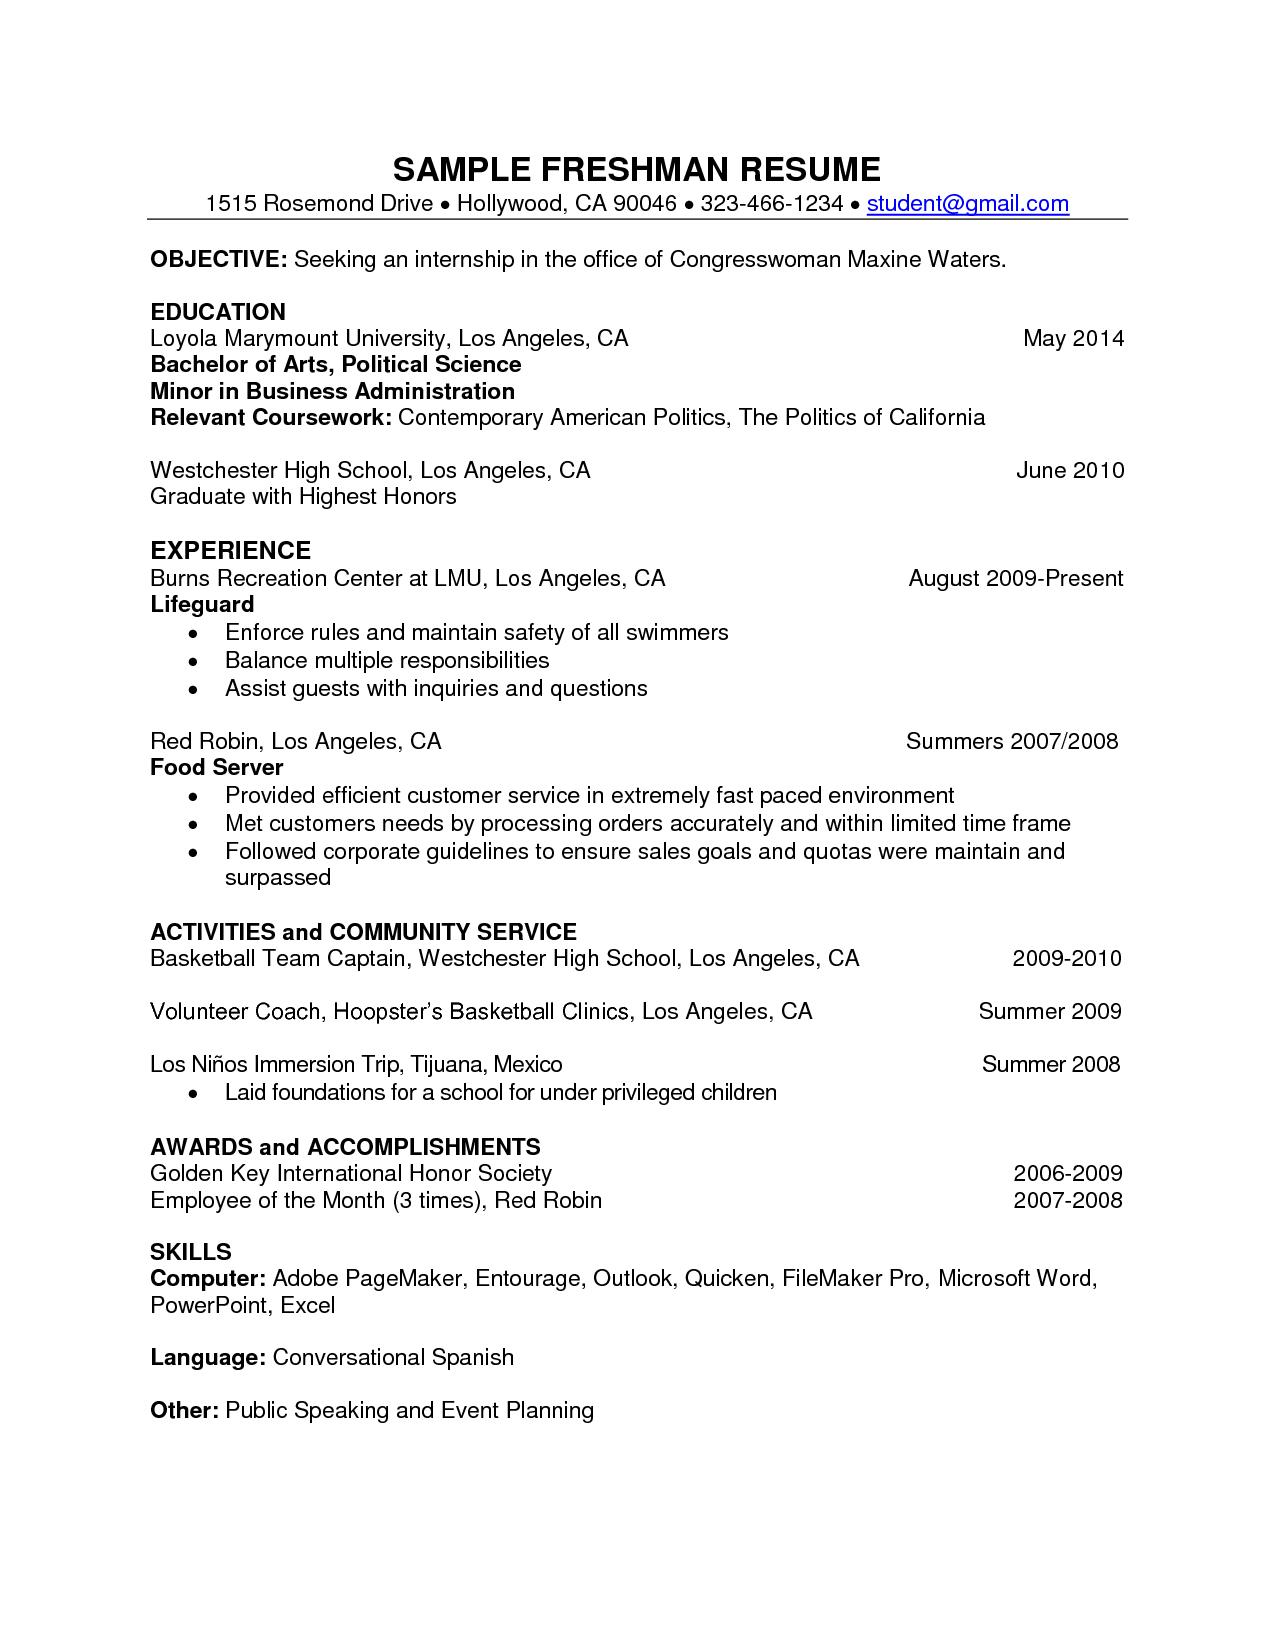 Resume Templates For Freshers Resume Writing Services Resume Writing Templates Student Resume Template